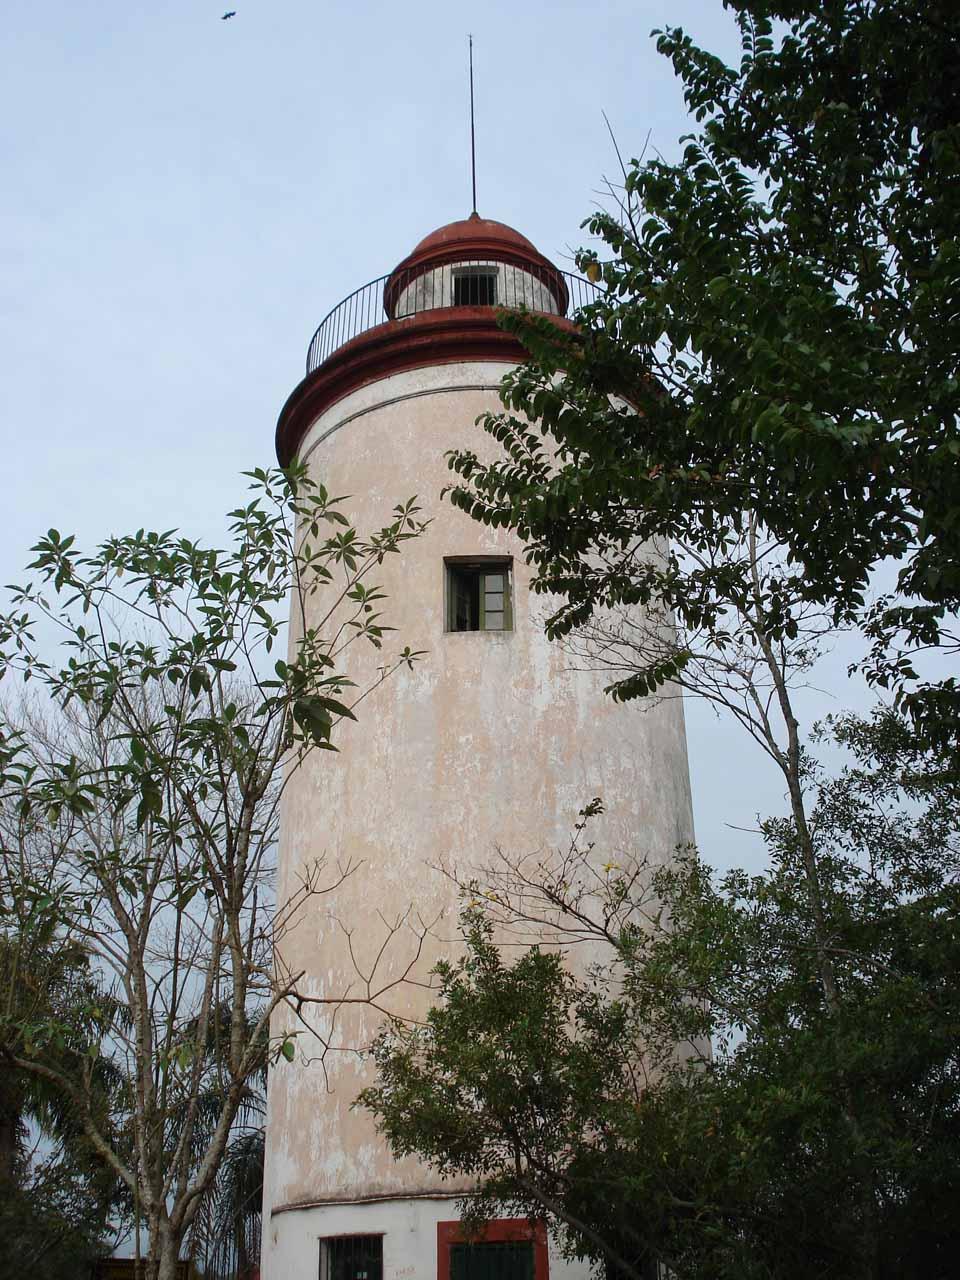 The Tower at Iguazu Falls